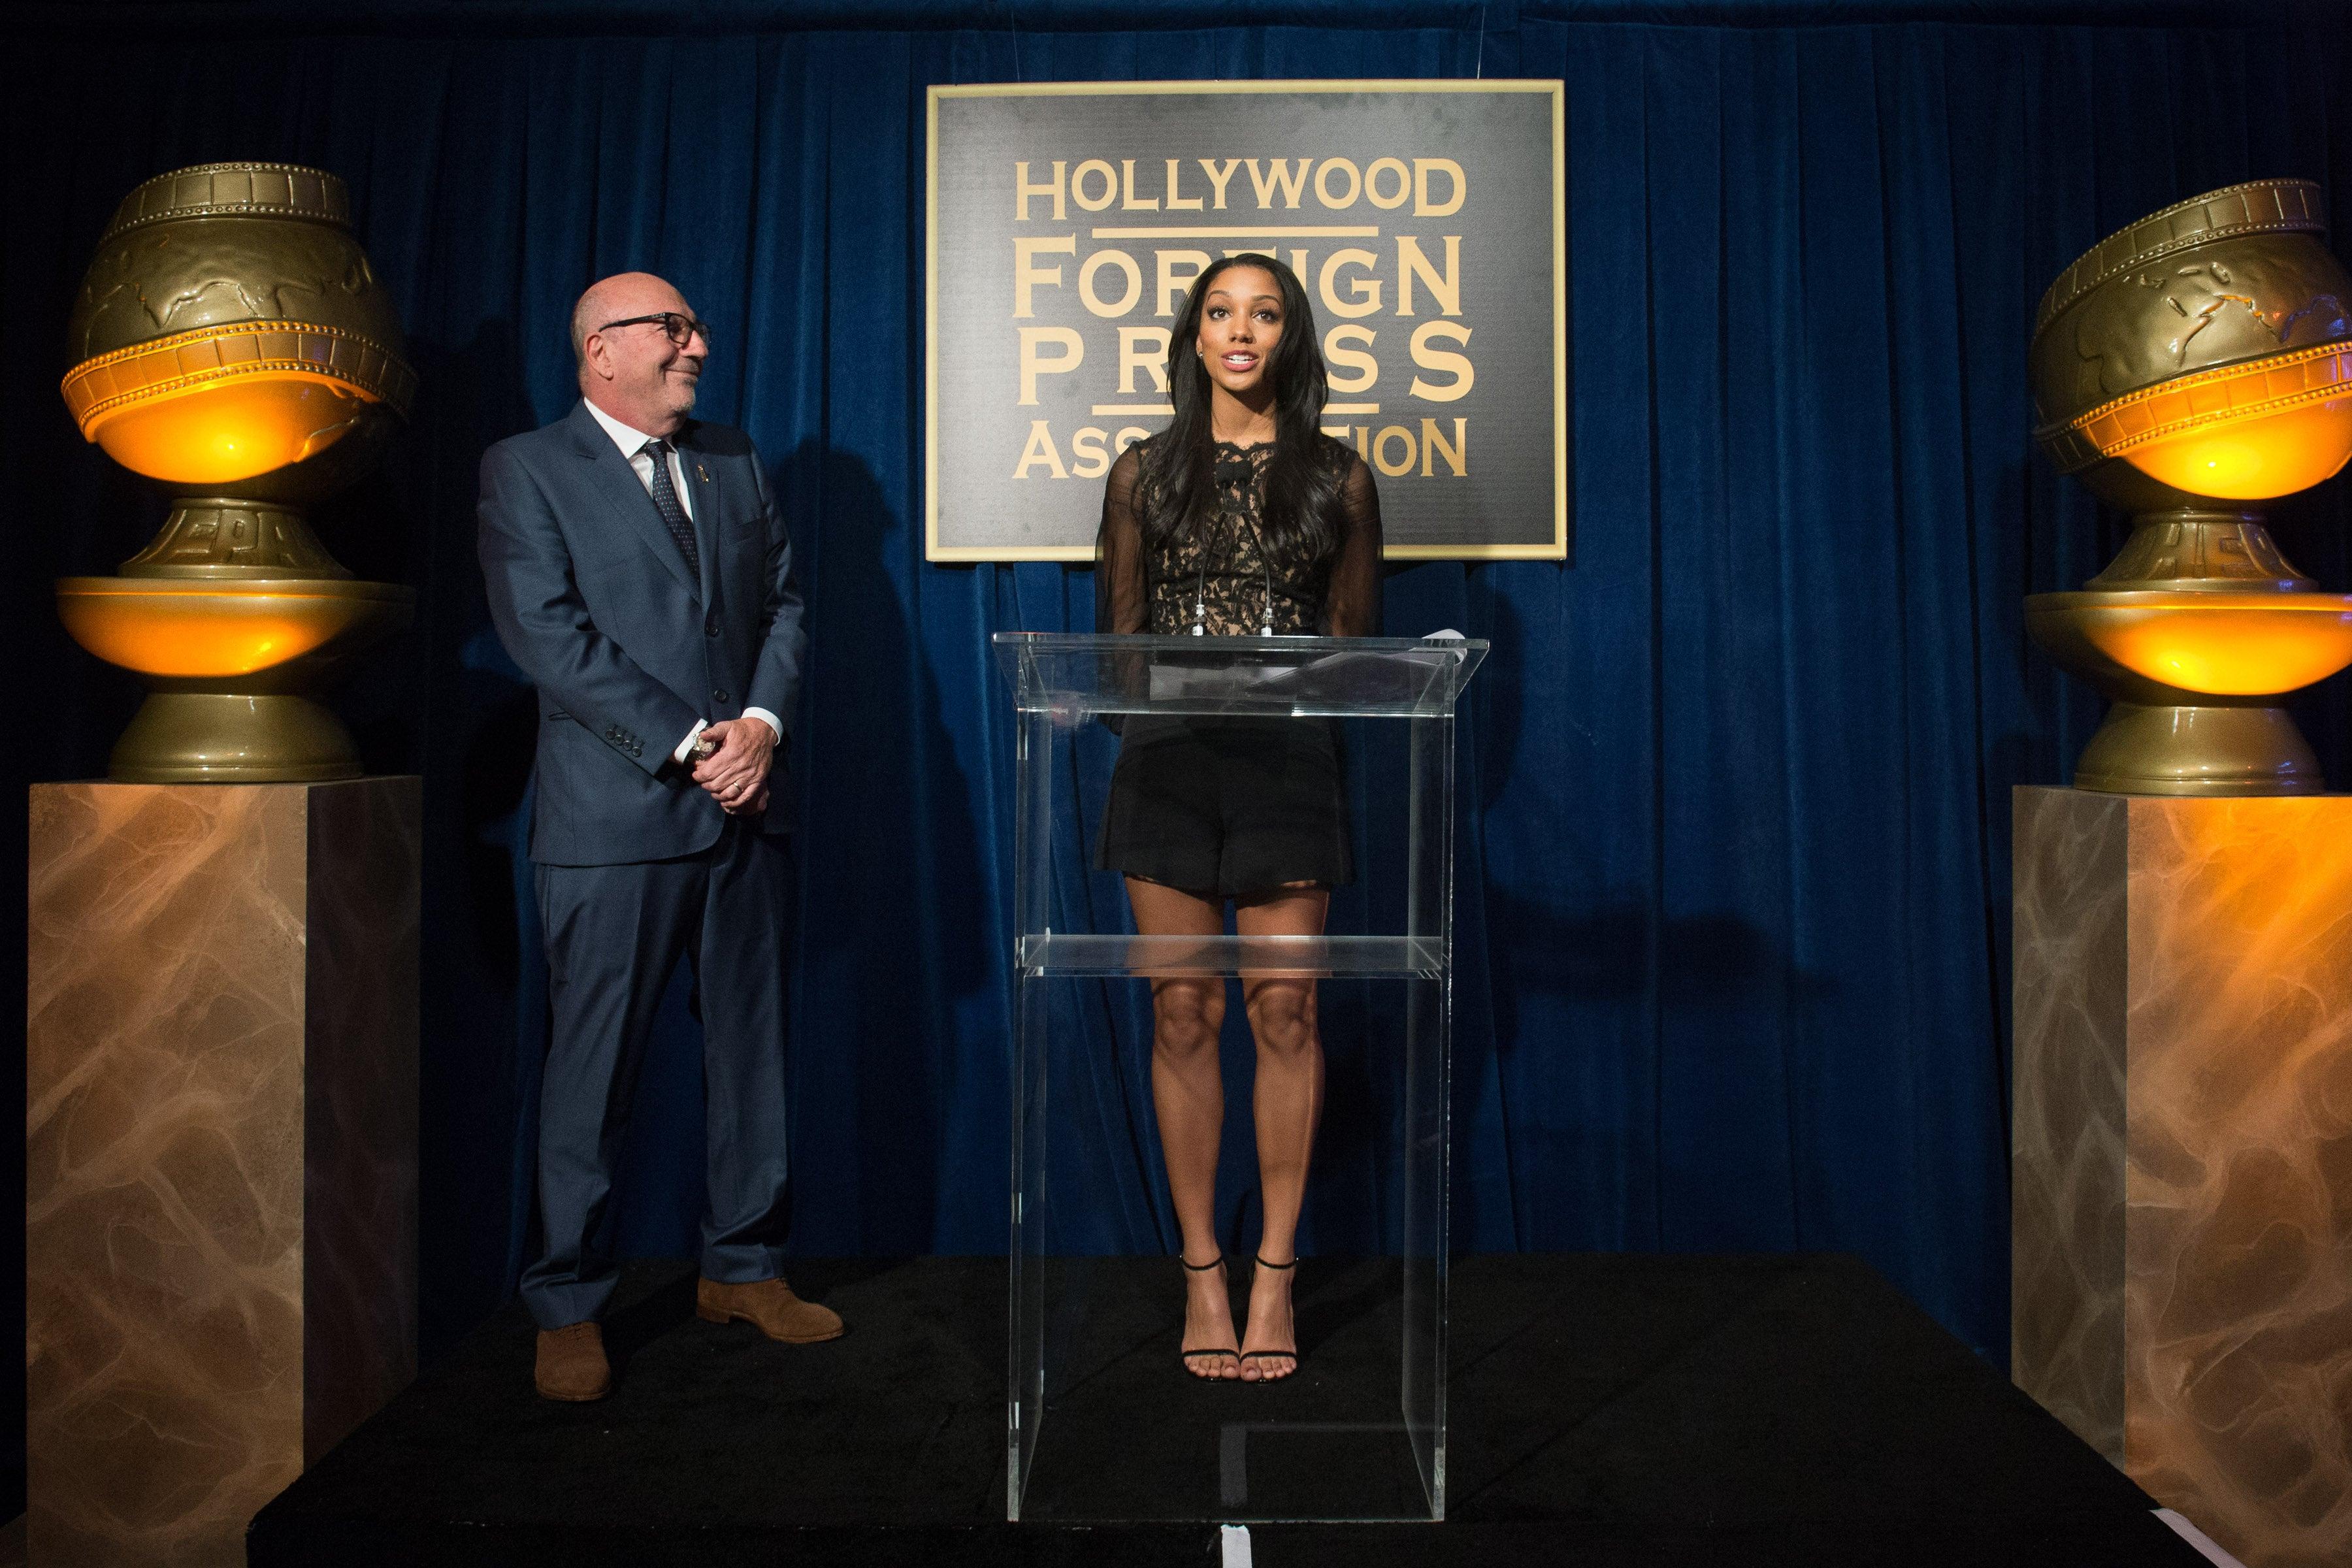 Corinne Fox, Miss Golden Globe 2016 and HFPA President Lorenzo Soria